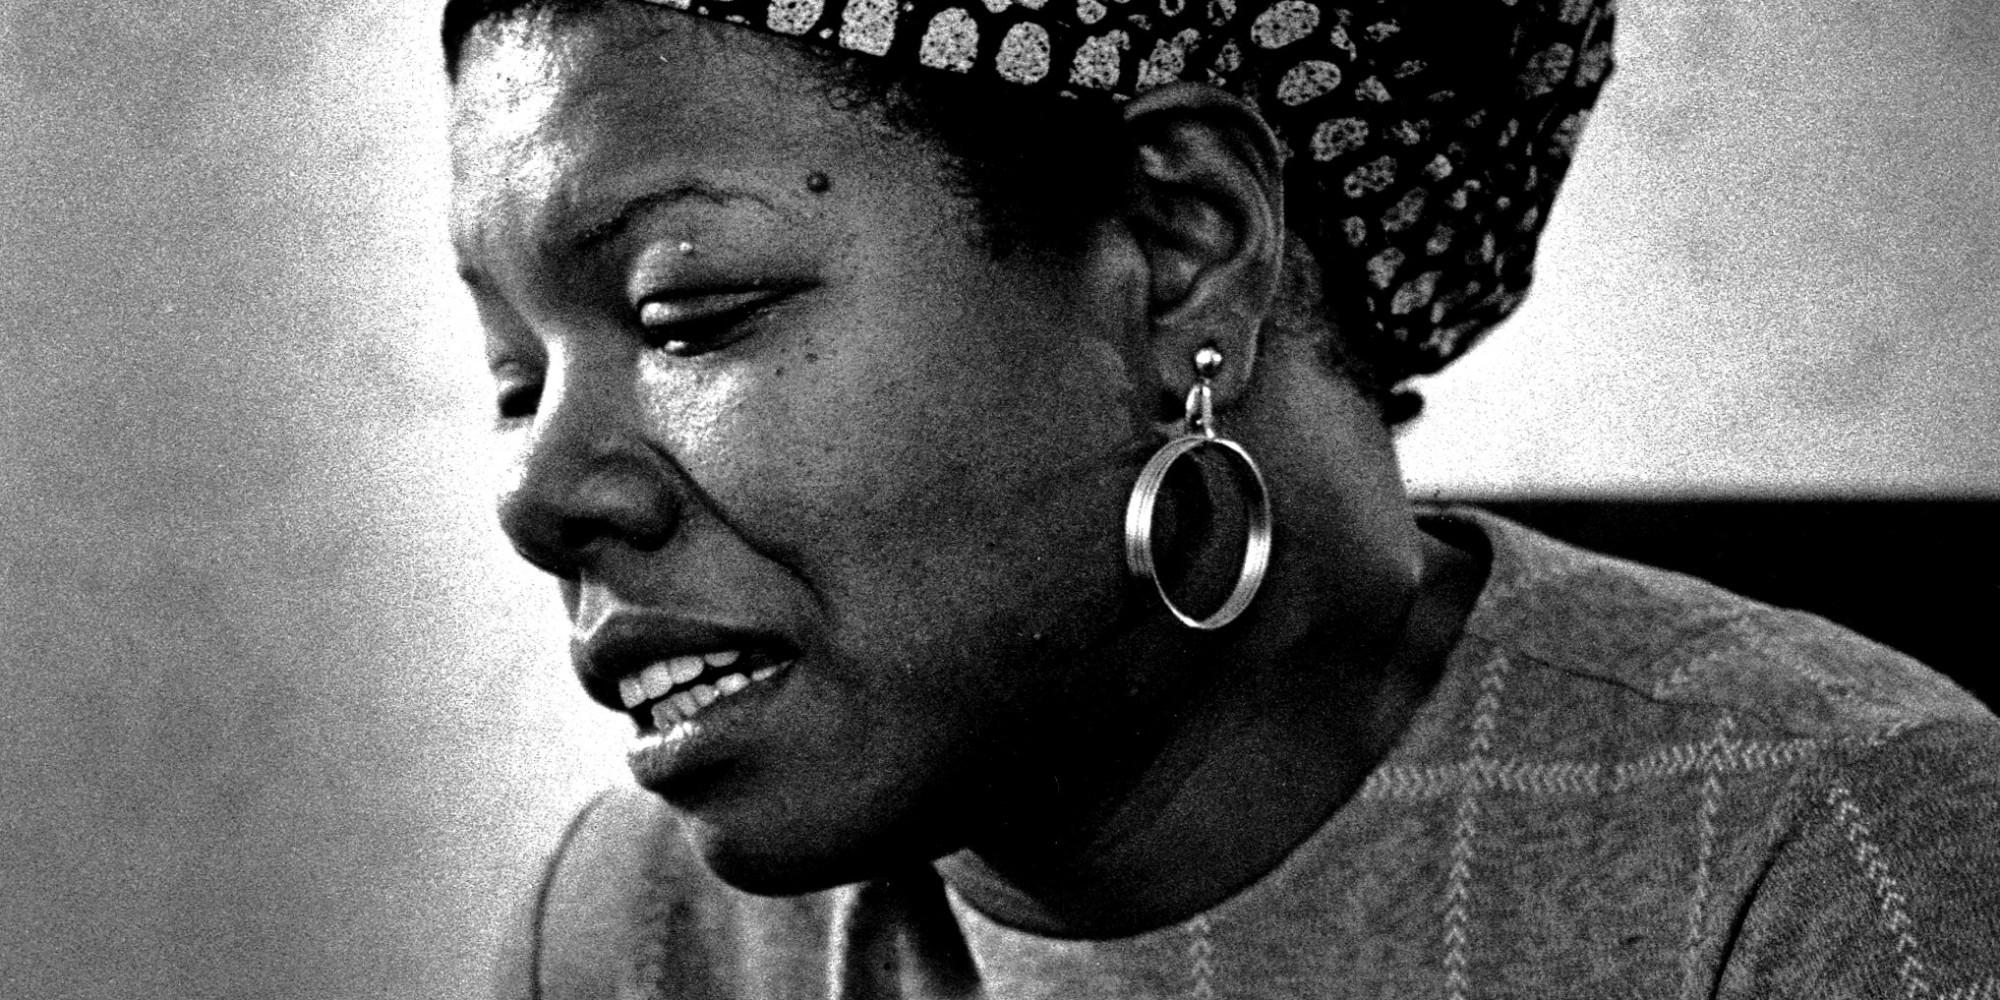 A portriat of poet Maya Angelou on June 3, 1974.